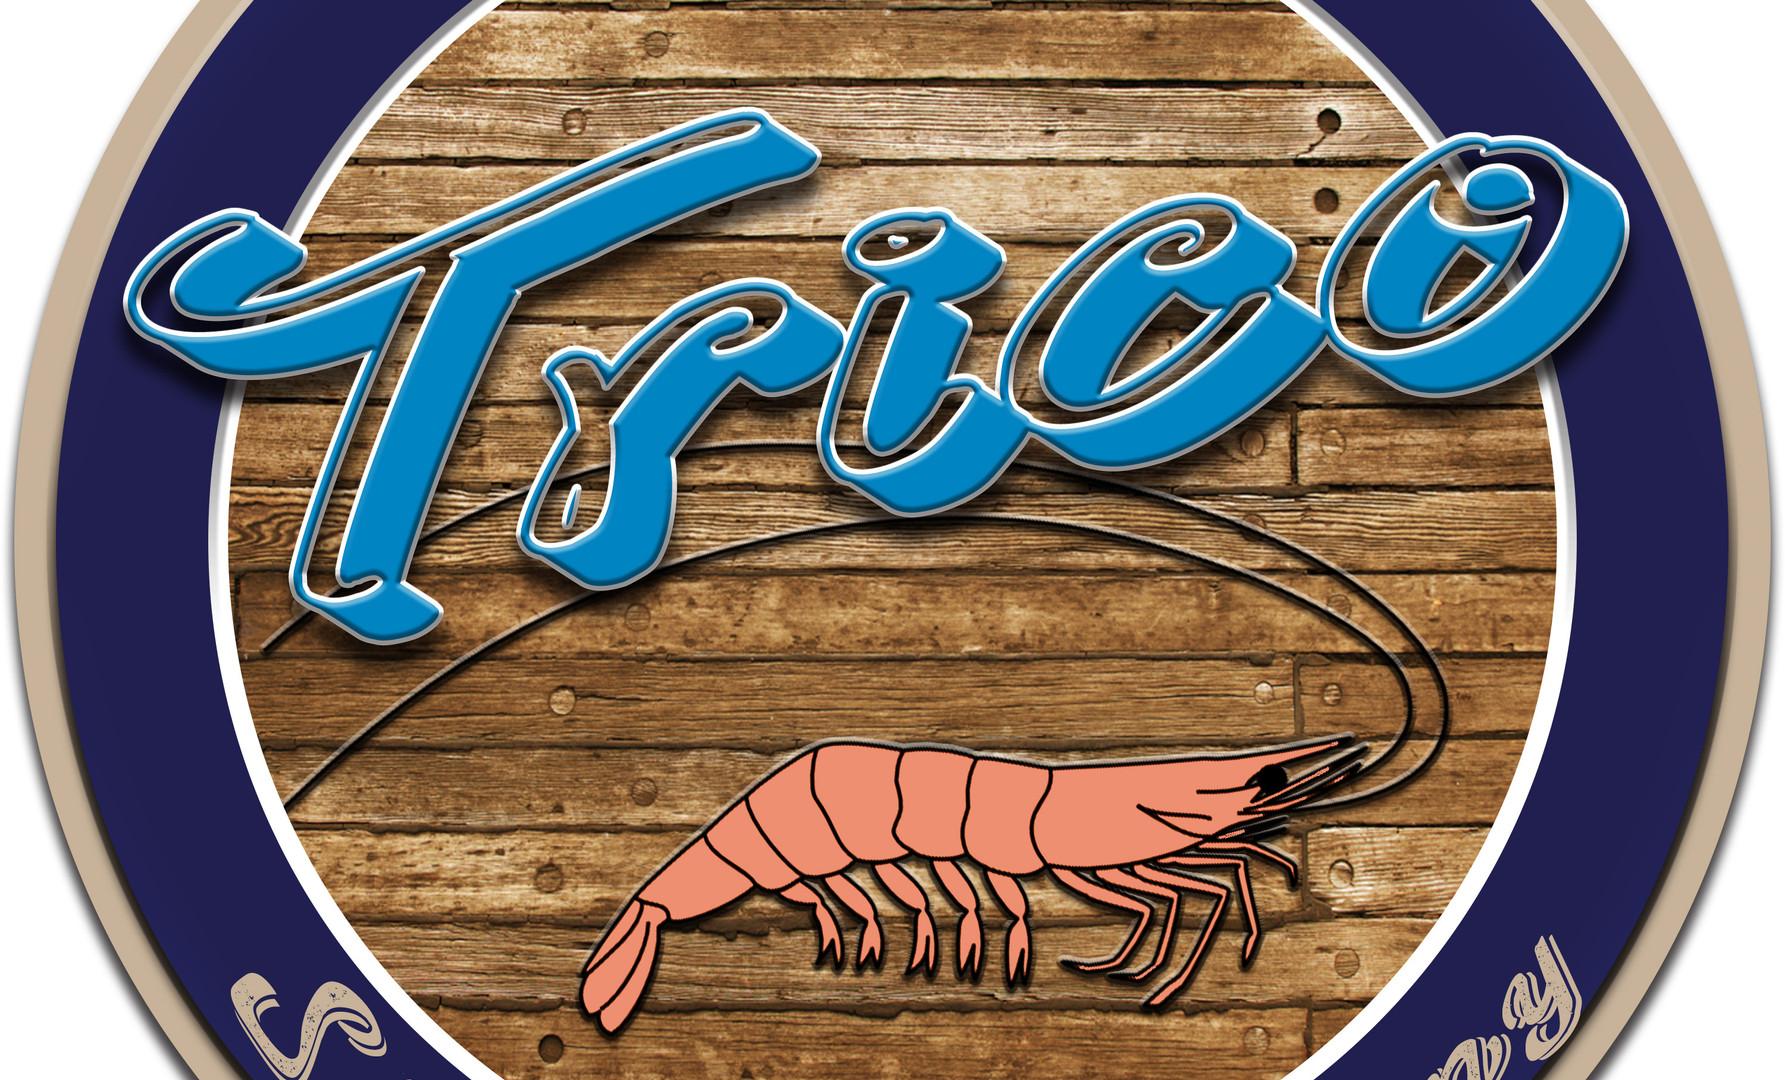 Trico's logo